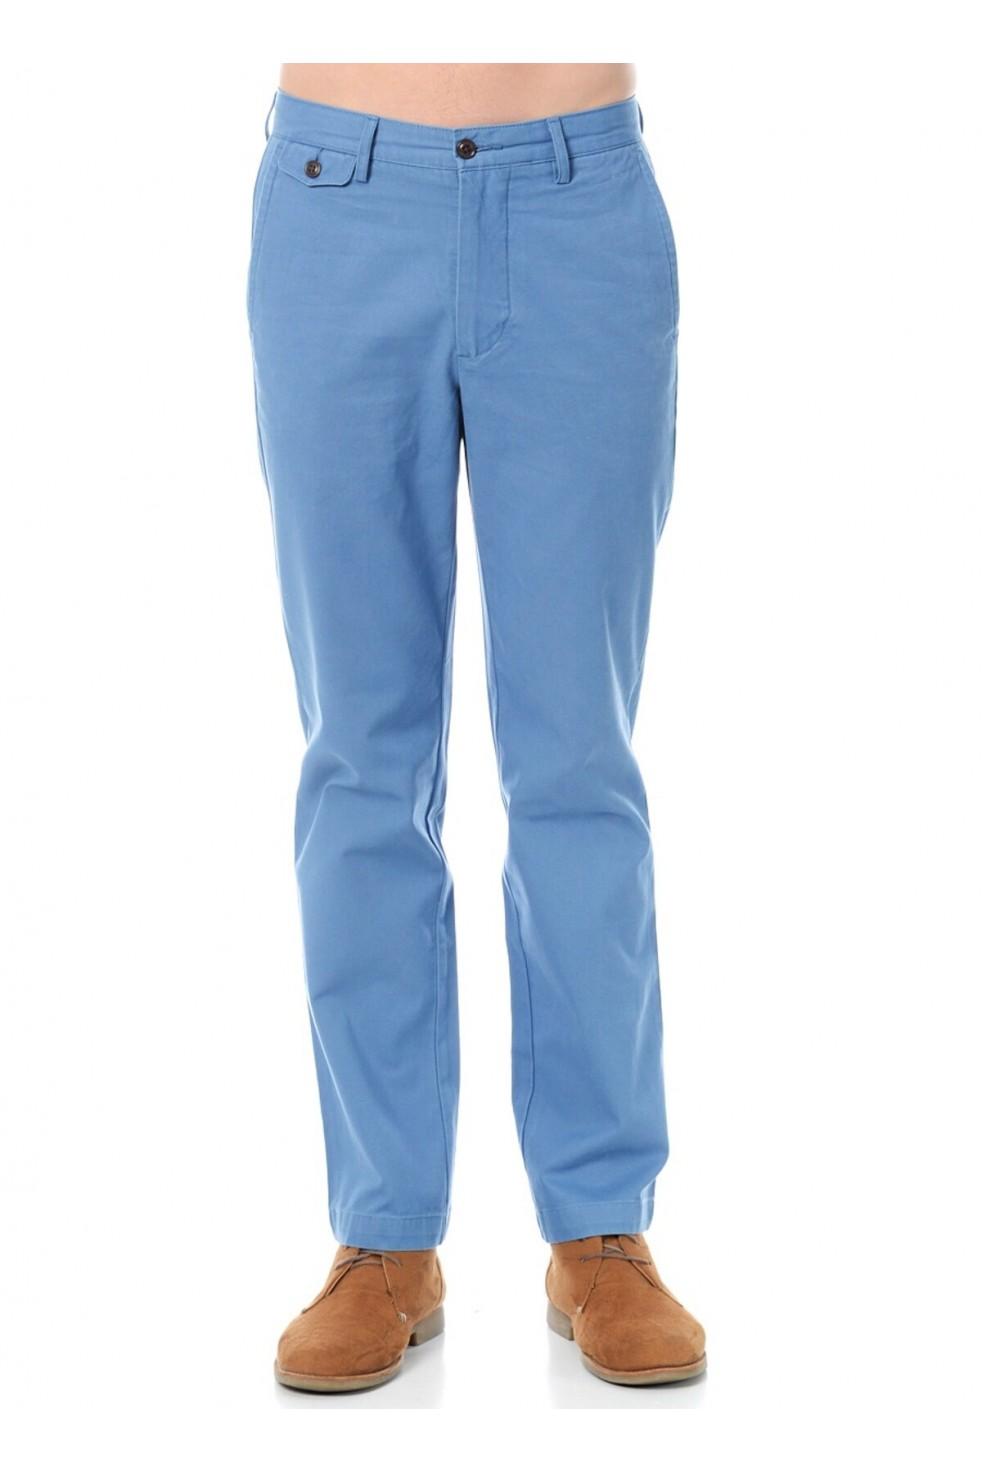 Dockers-Erkek-Pantolon-D1-Slim-Fit-47576-0005